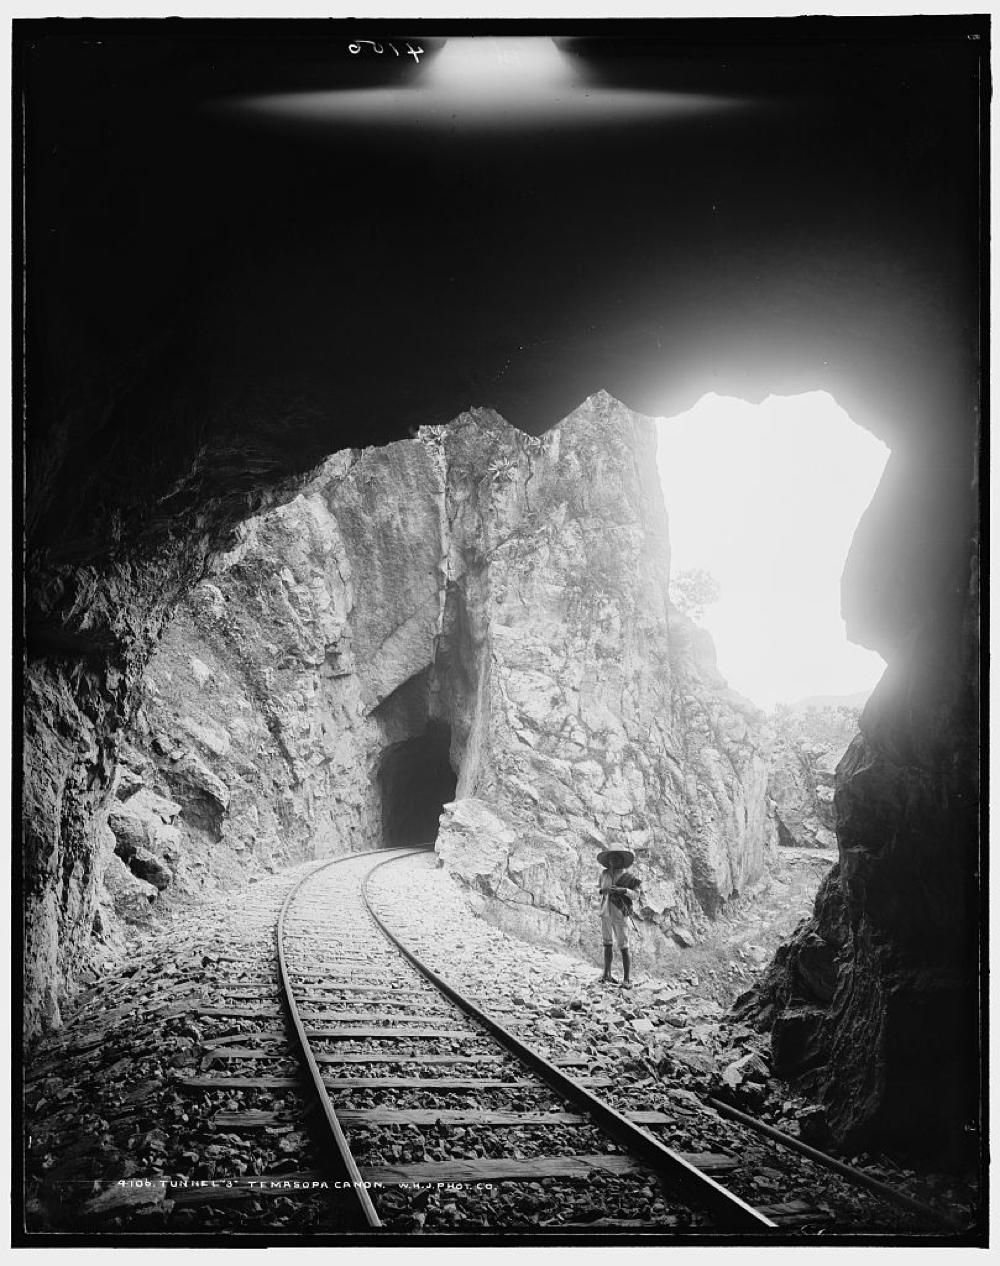 Tunnel 3, Temasopa [sic] Canon